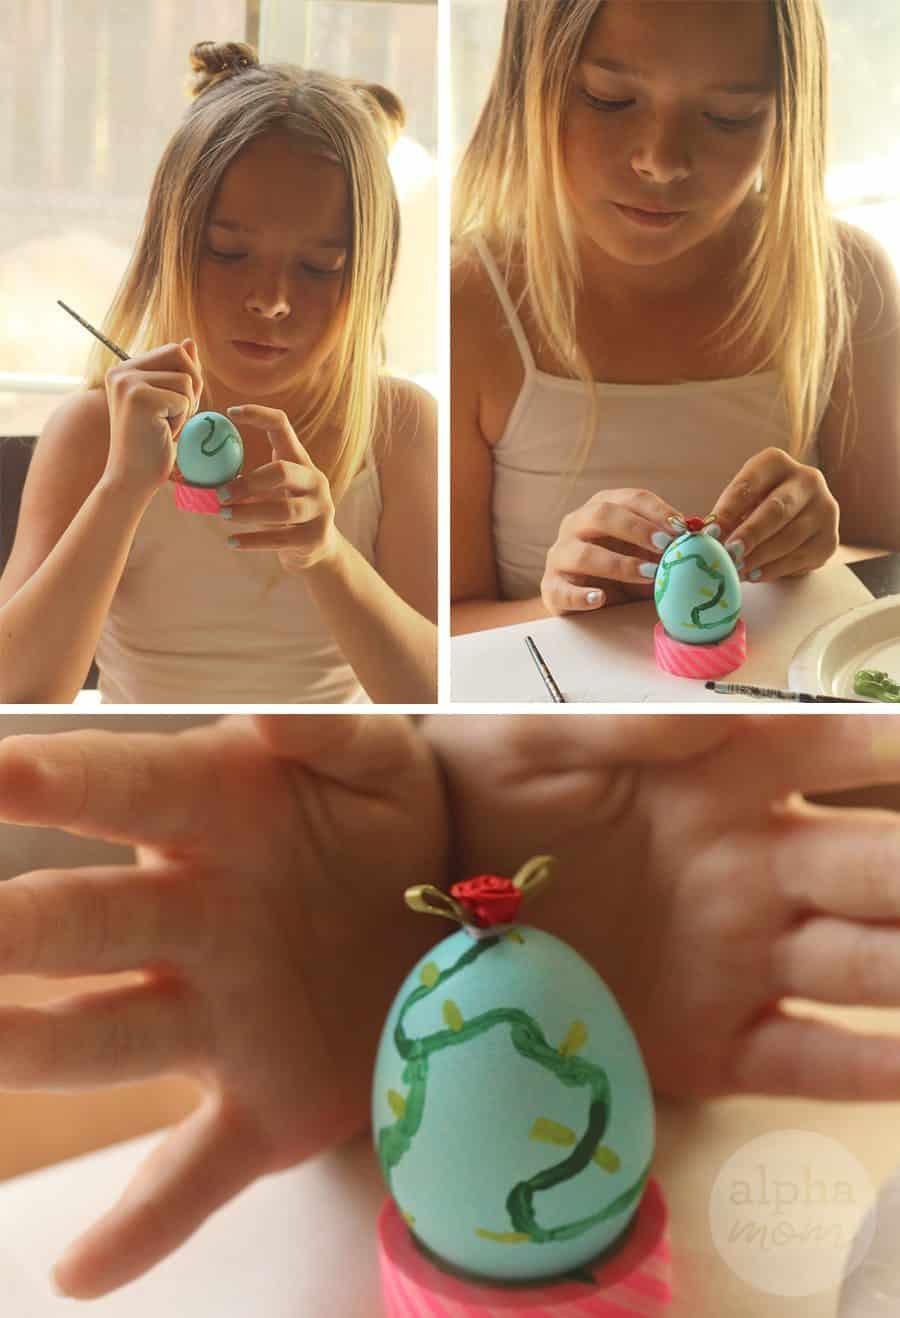 10 Beauty and the Beast Inspired Easter Egg DIYs: Enchanted Rose (by Brenda Ponnay for Alphamom.com)